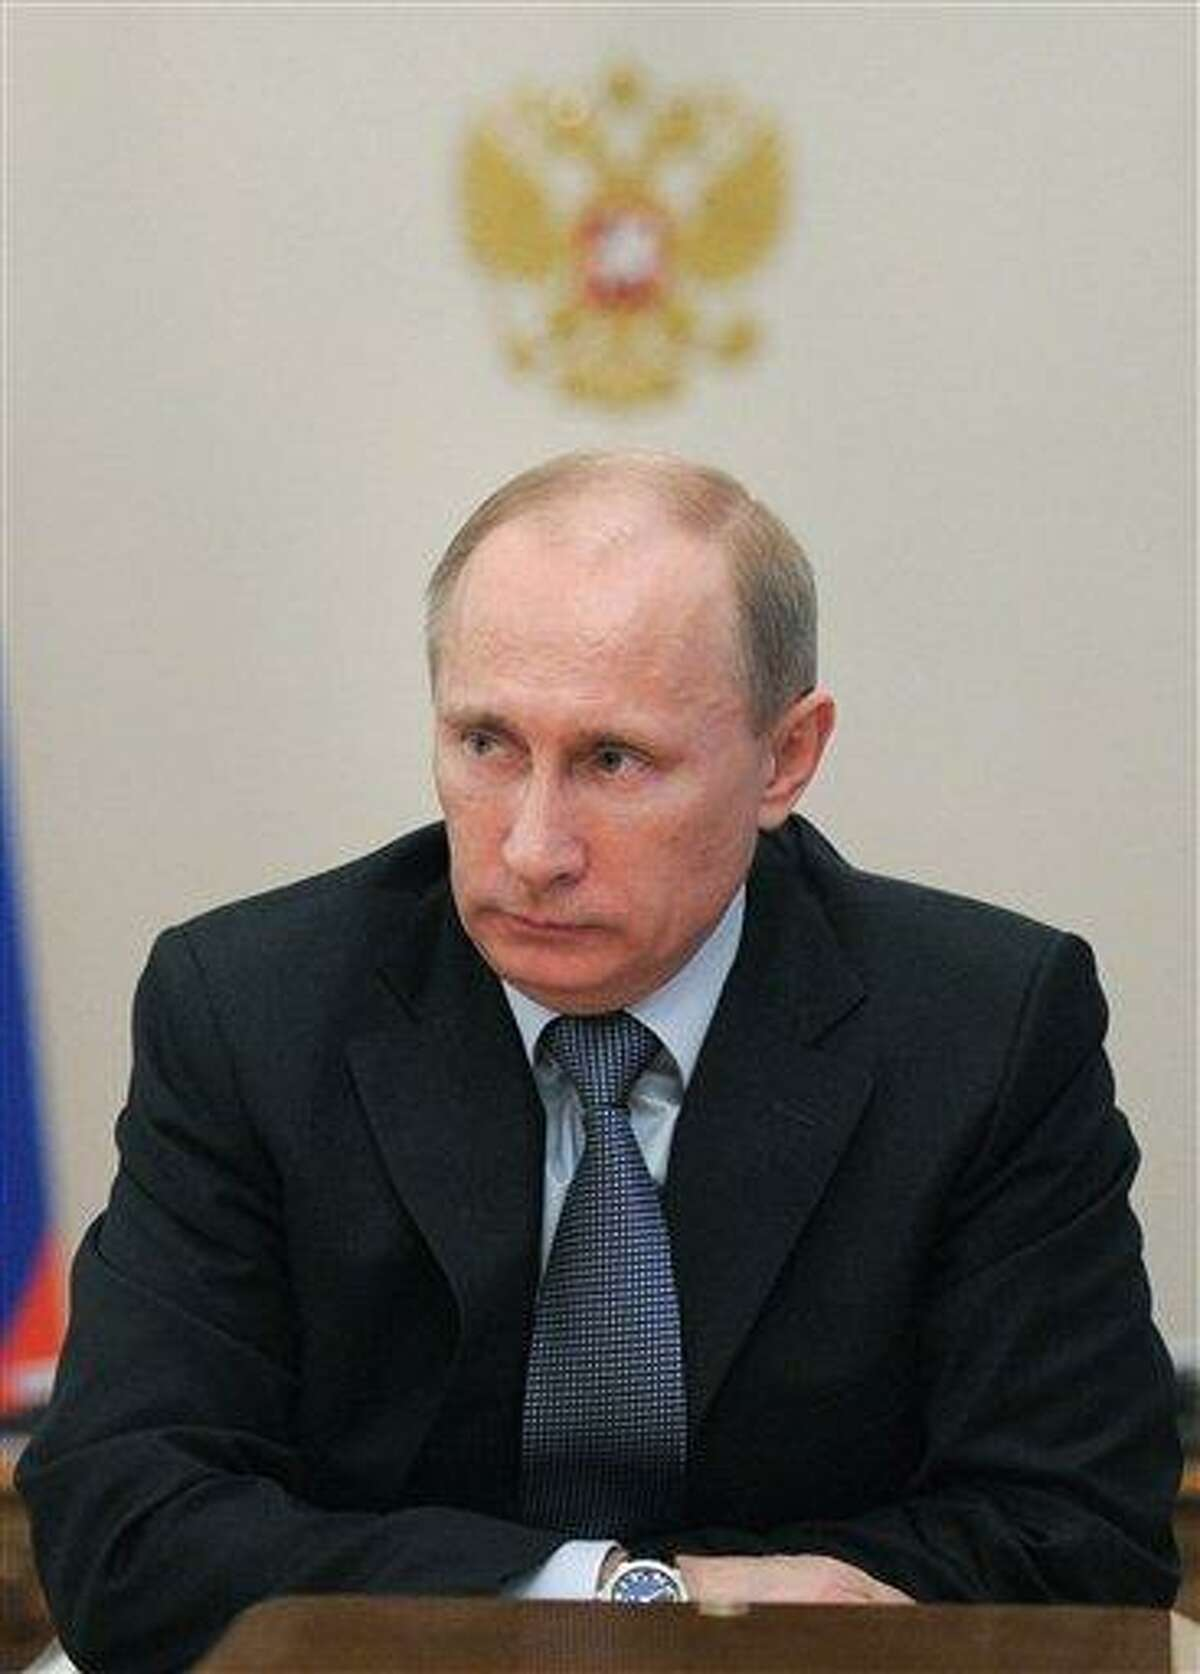 Russian Prime Minister Vladimir Putin Associated Press